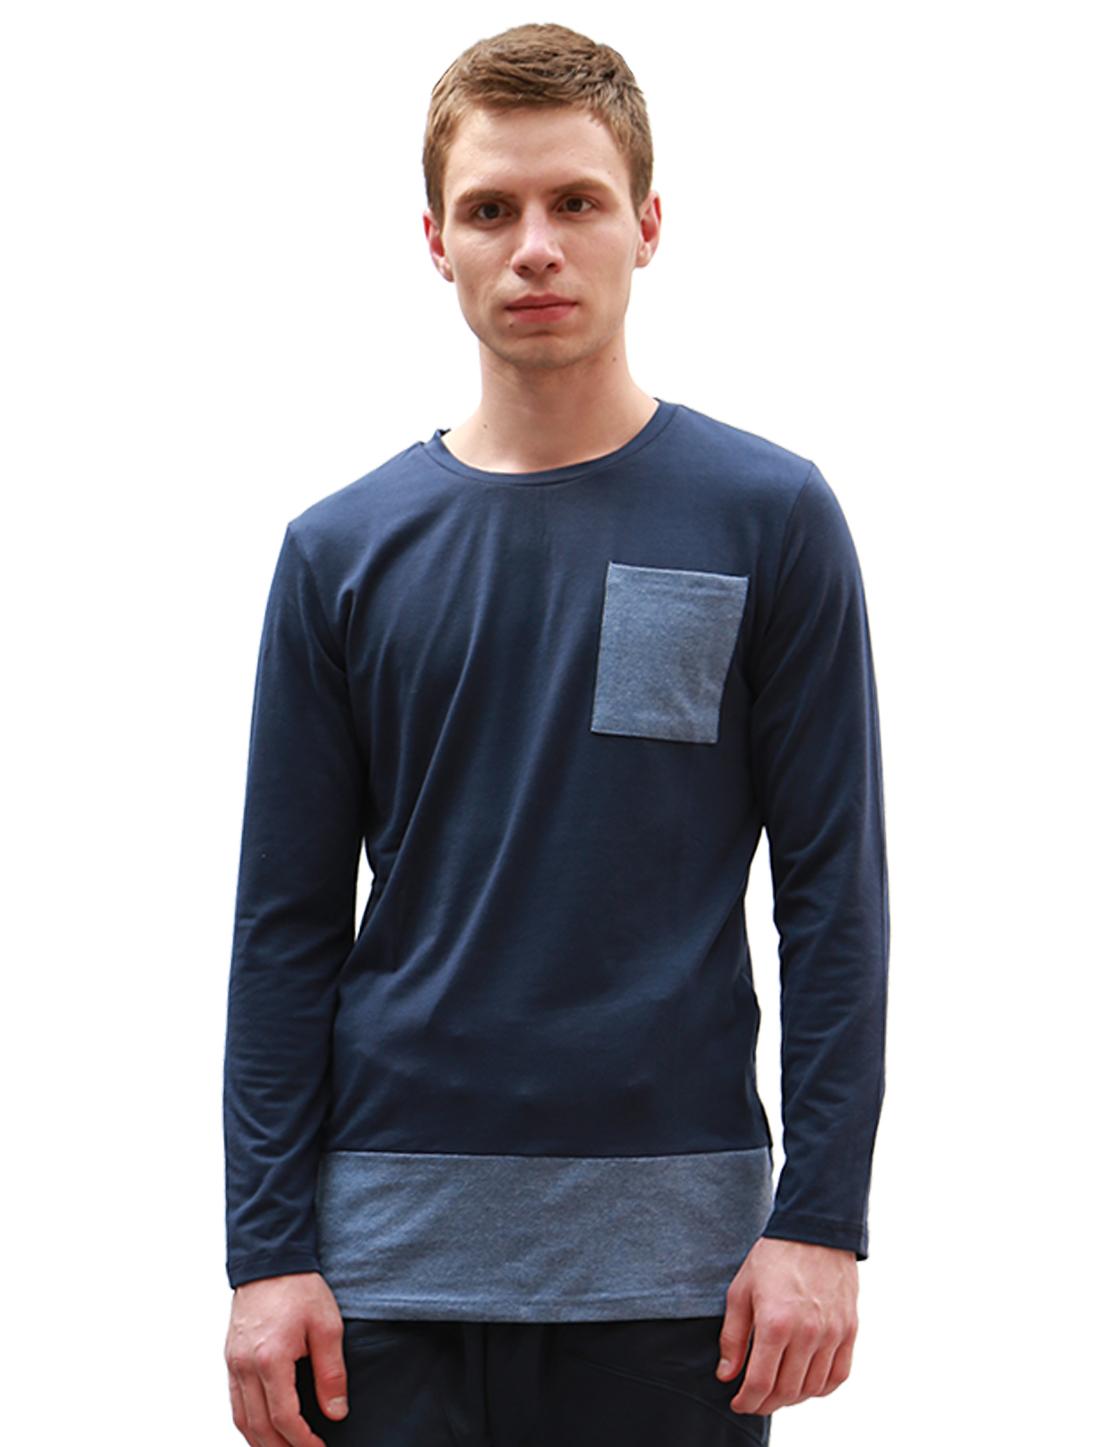 Men Contrast Color Longline Chest Pocket Tee Shirt Navy Blue M